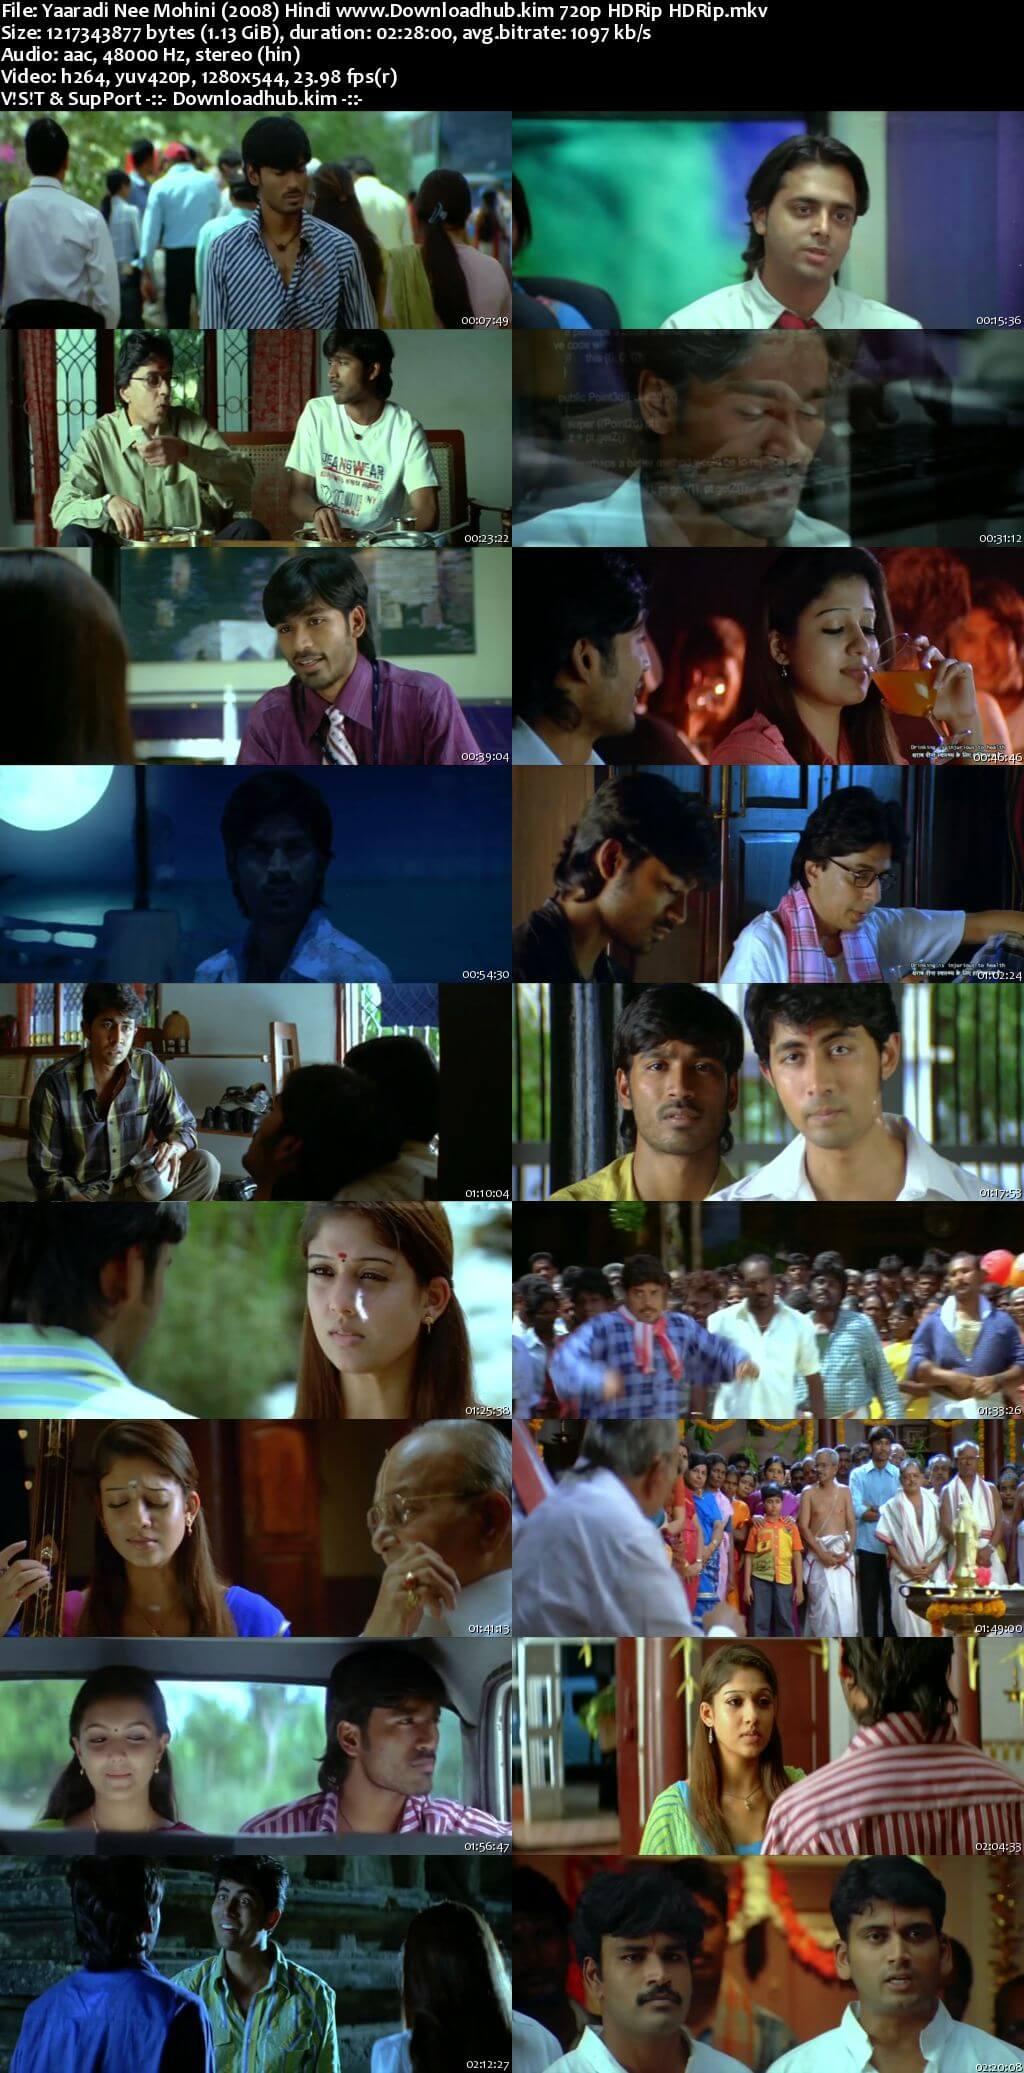 Yaaradi Nee Mohini 2008 Hindi Dubbed 720p HDRip x264